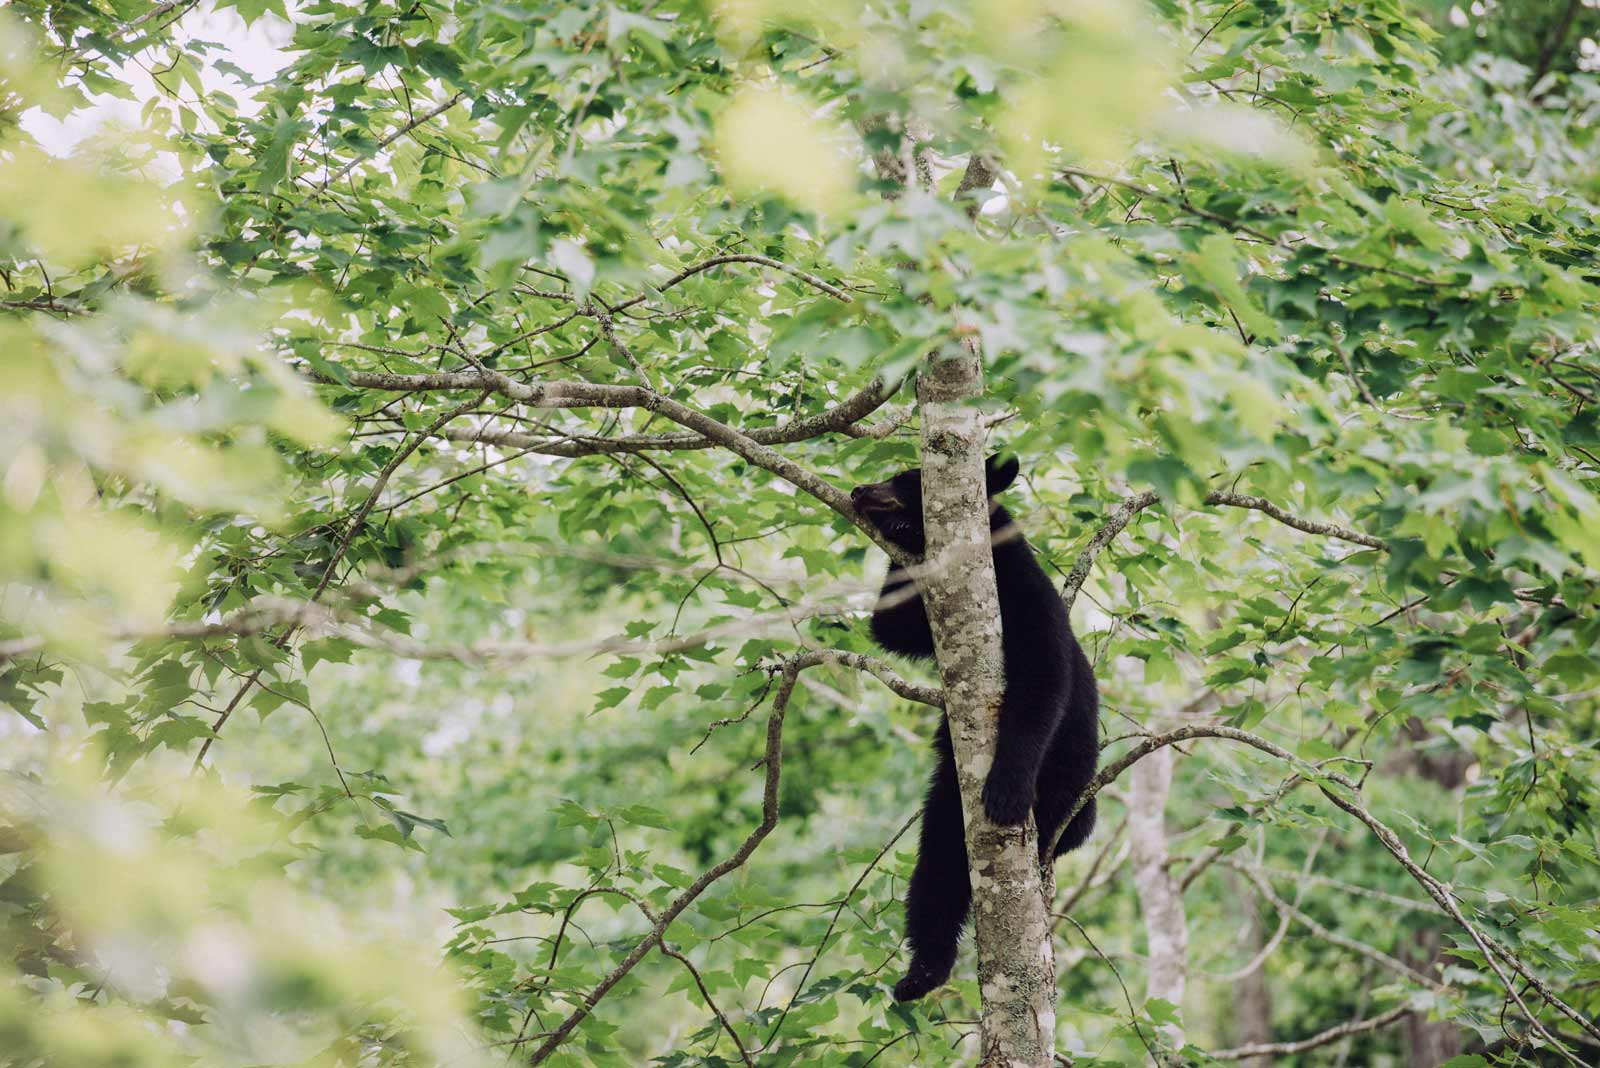 safari a l'ours nouveau brunswick